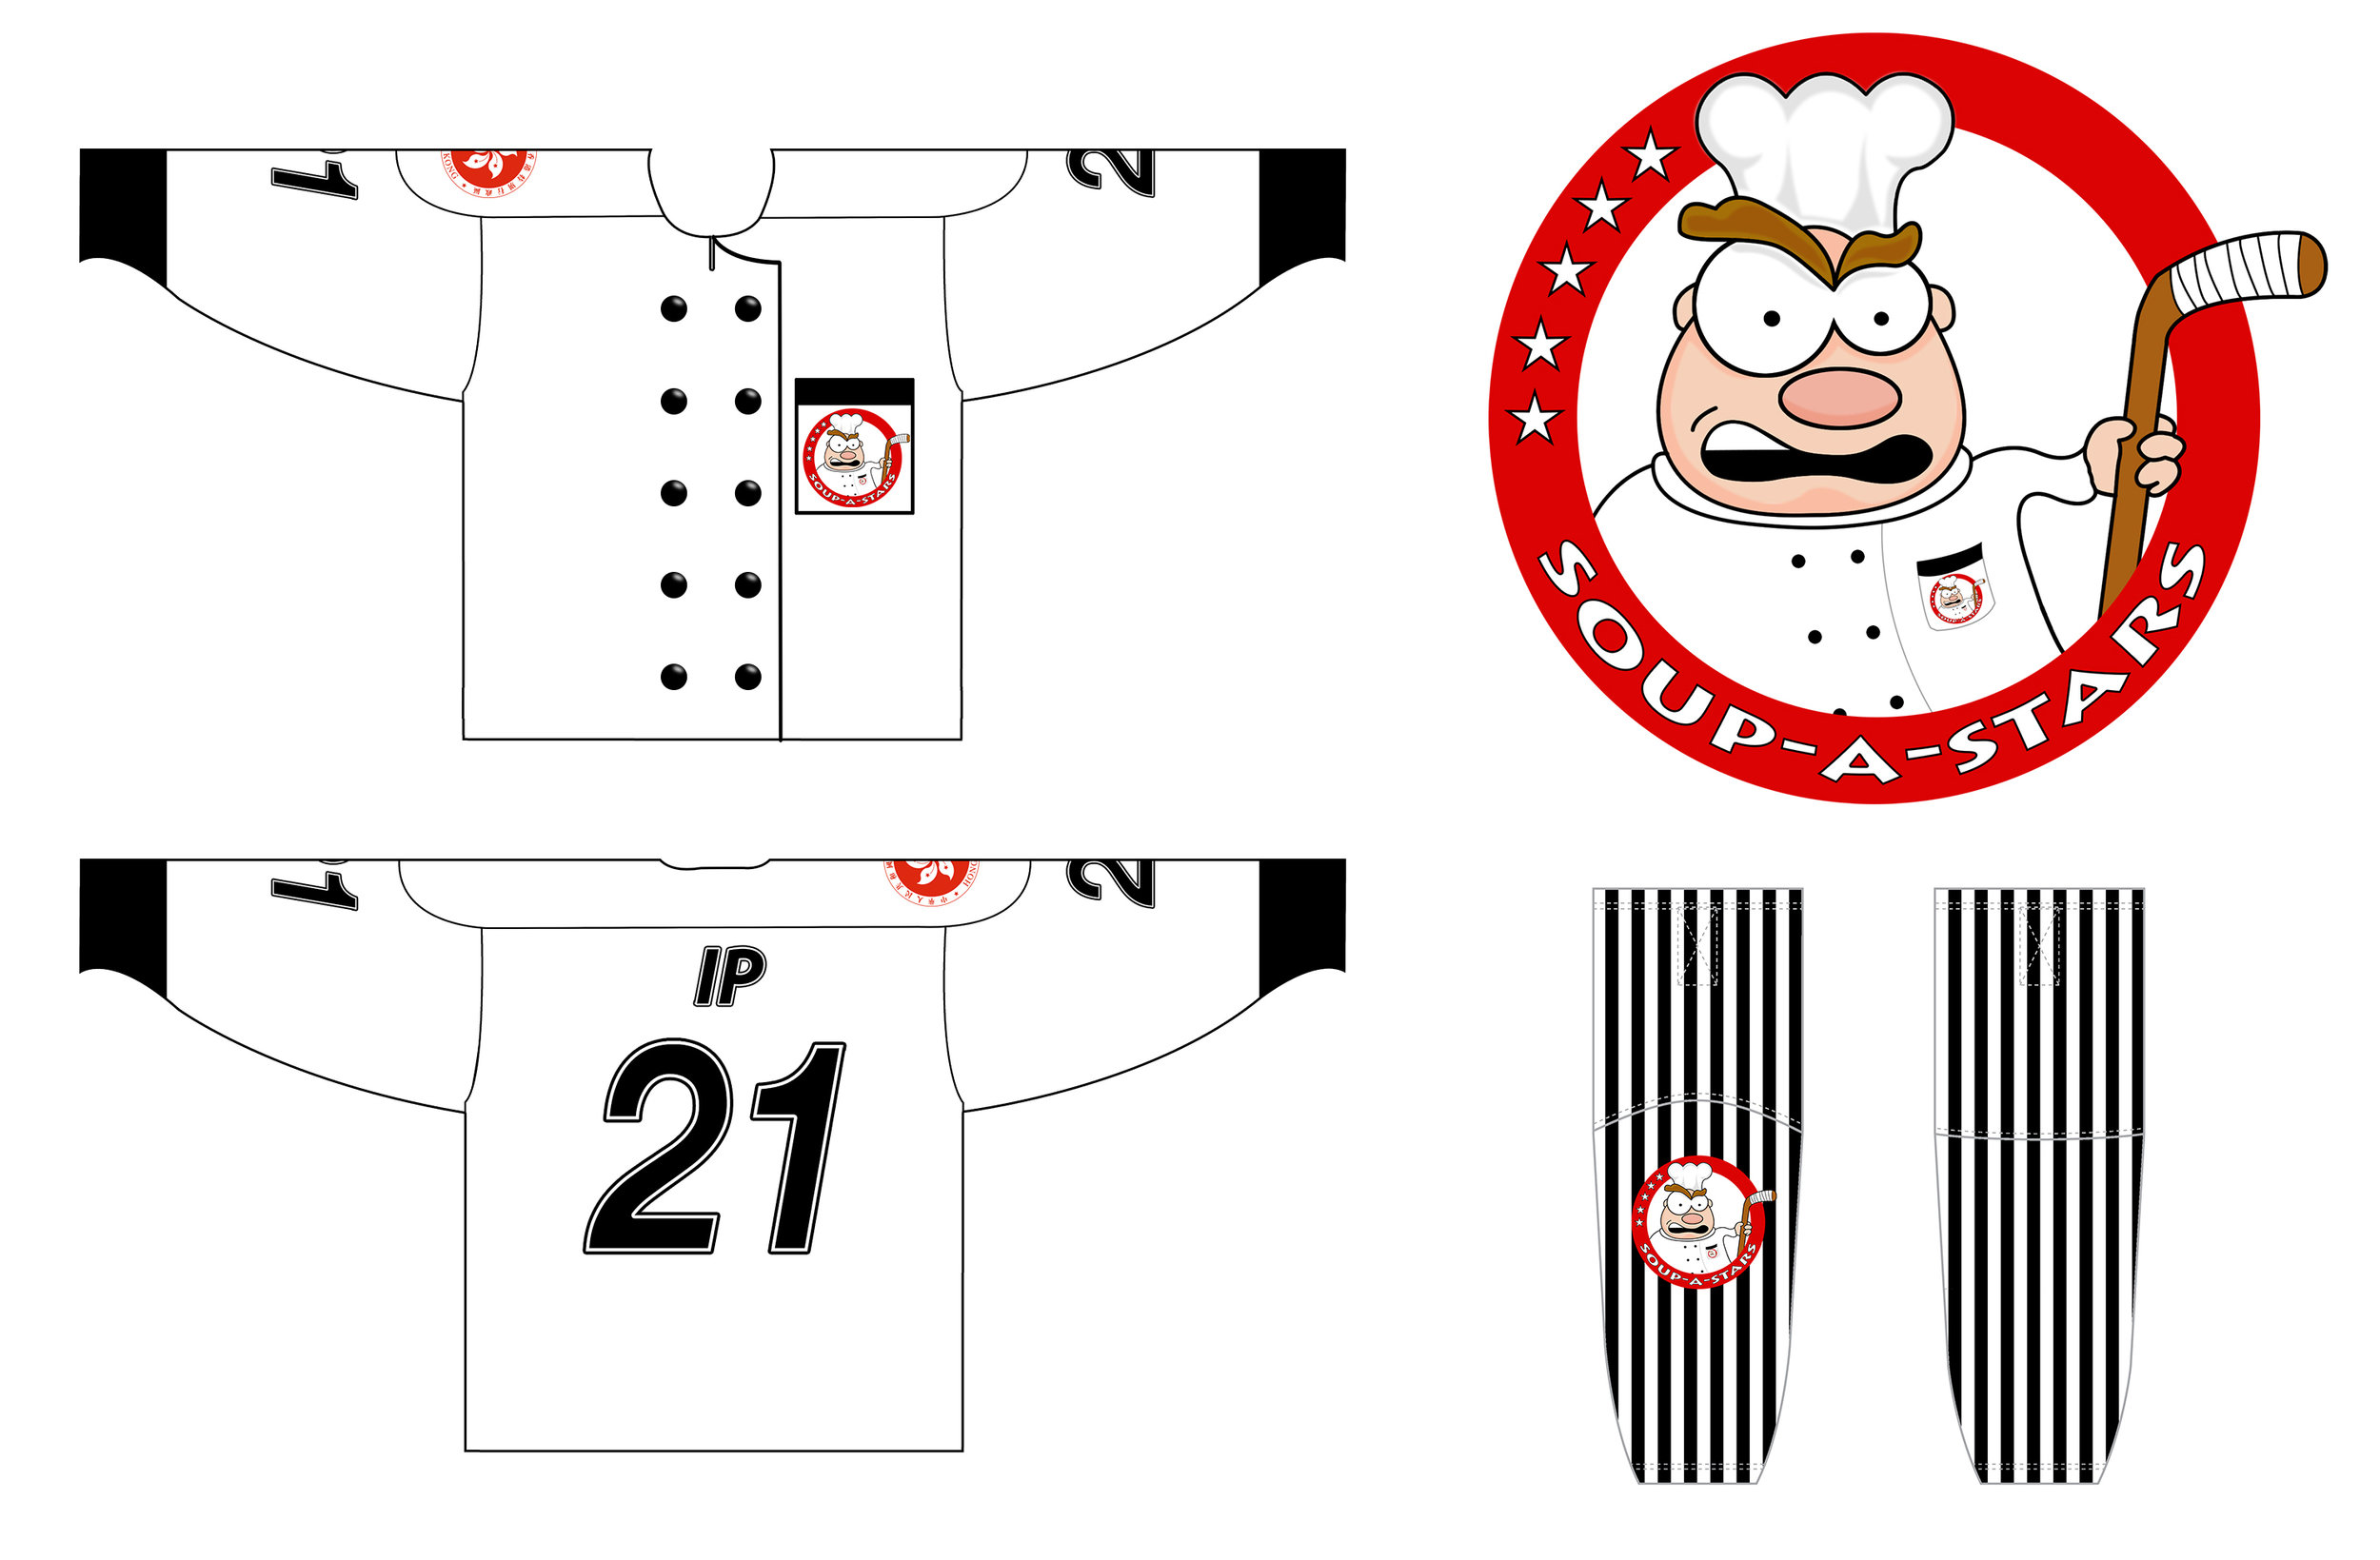 soup-a-stars uniform.jpg